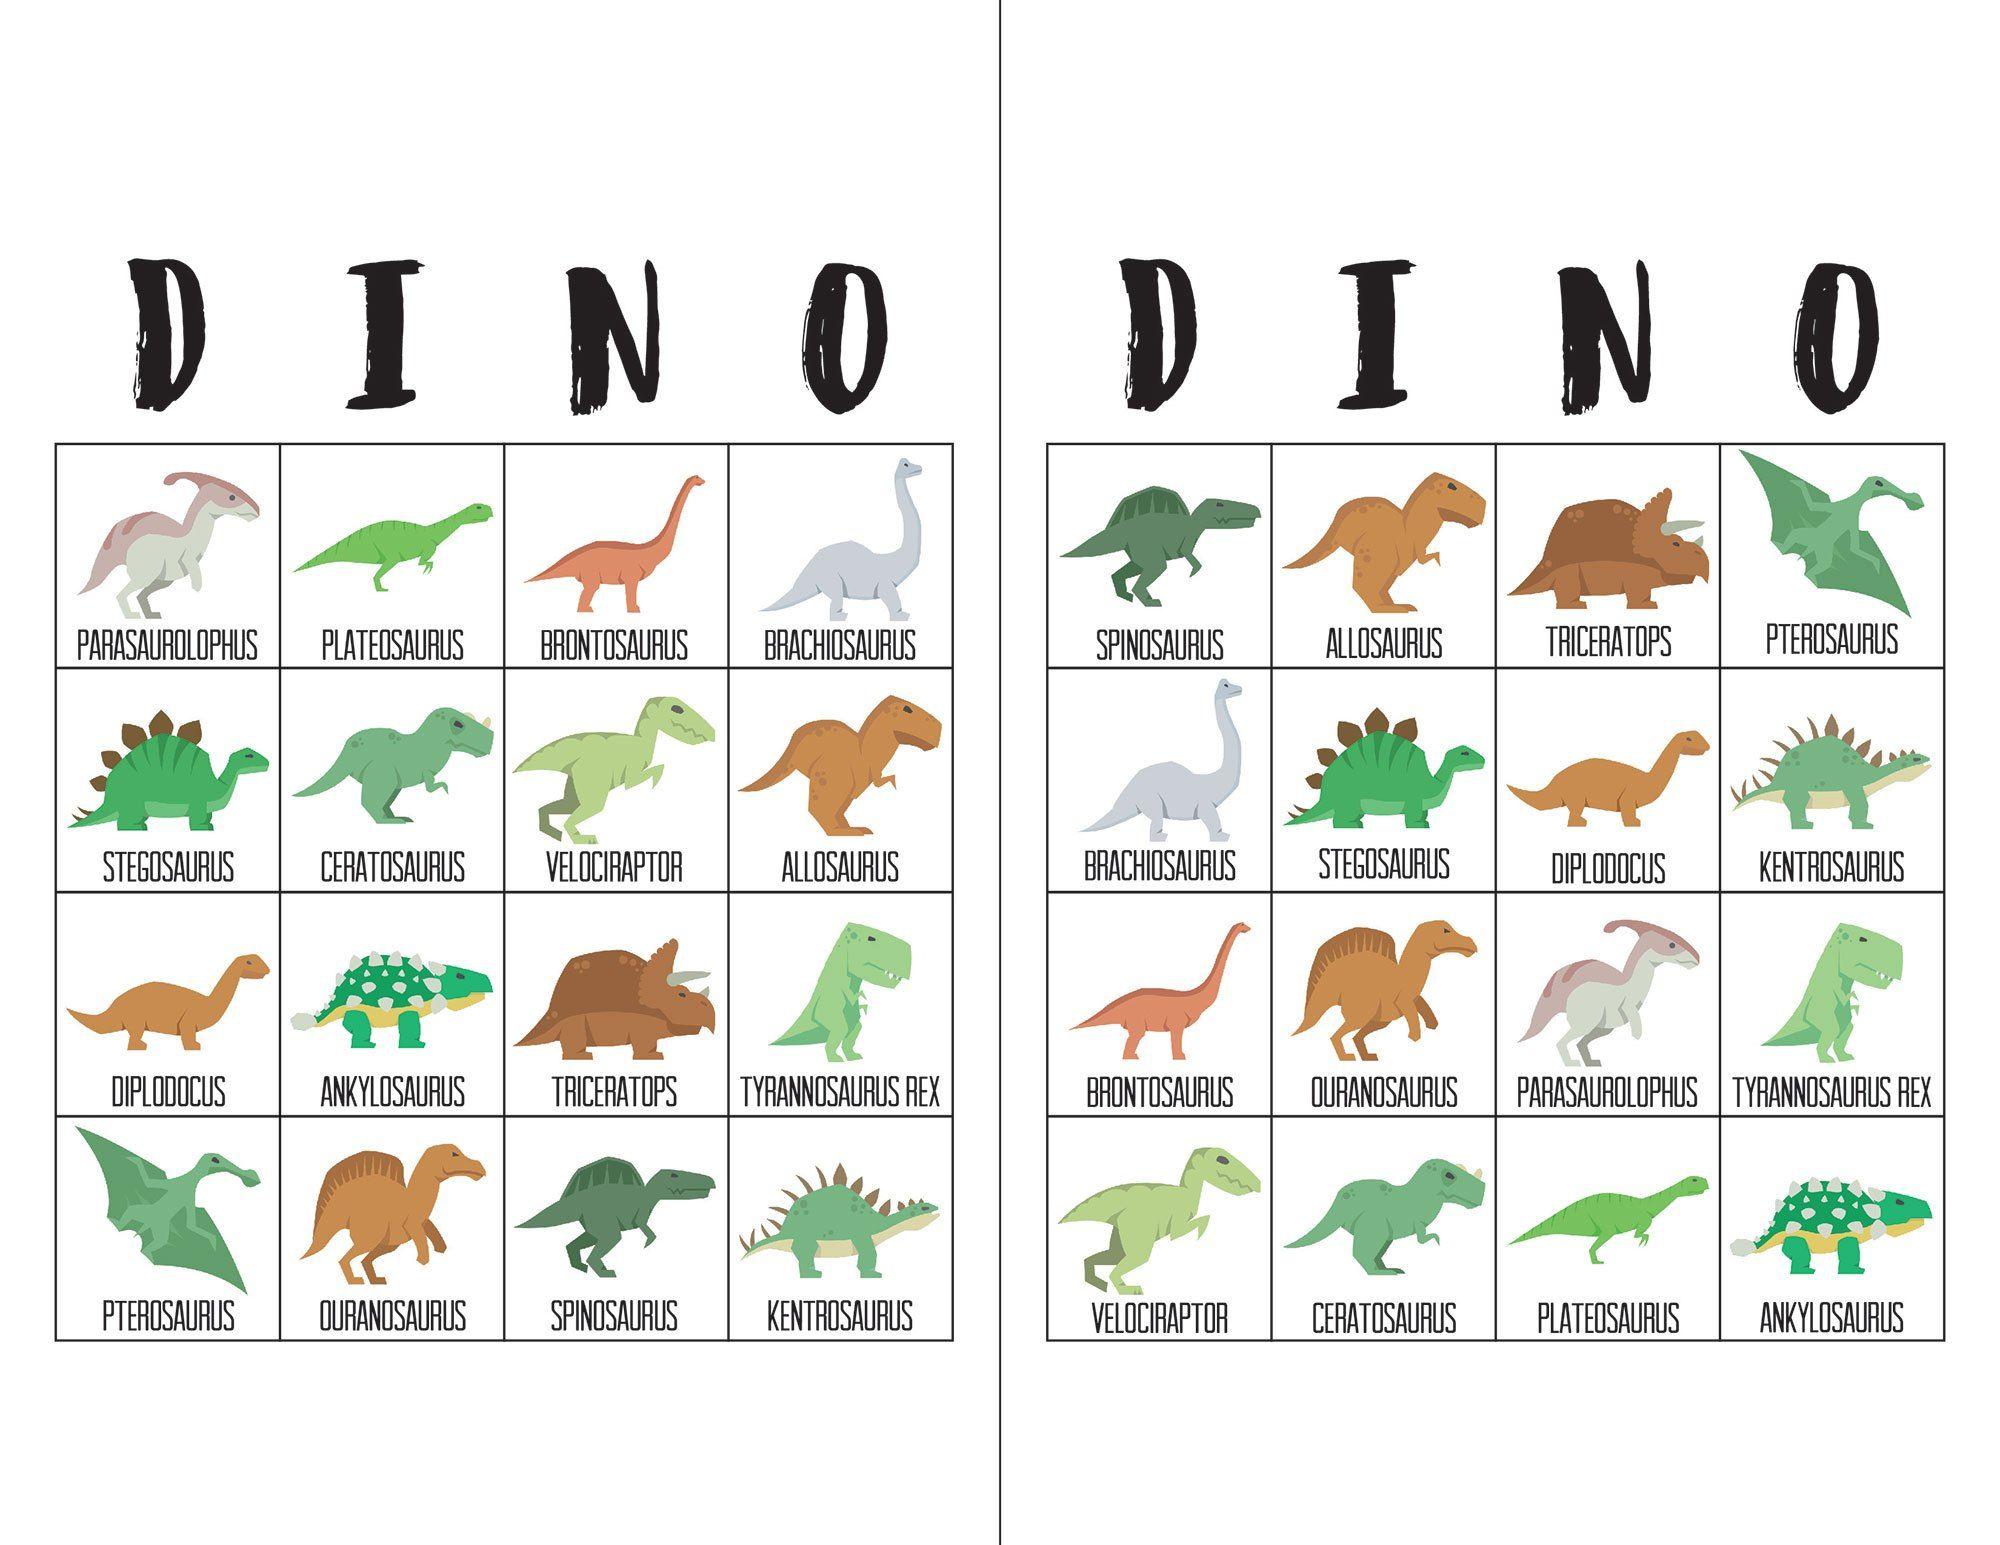 Free Printable Dinosaur Bingo Cards Great Activity For Dinosaur Birthday Parties Classrooms Or At Hom Bingo Cards Bingo Cards Printable Dinosaur Activities [ 1545 x 2000 Pixel ]